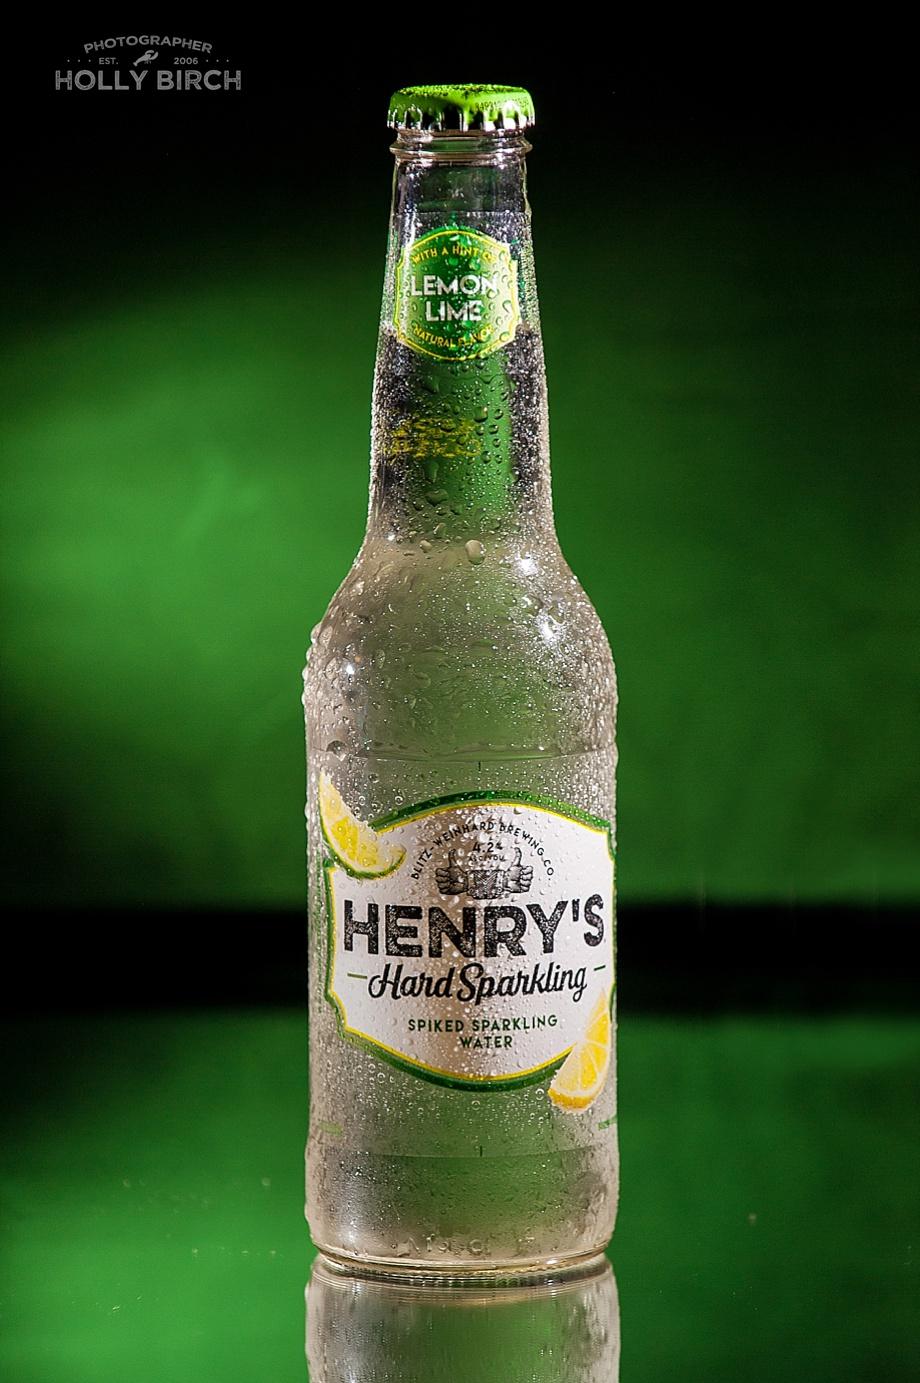 Henry's Hard sparkling spiked water lemon lime